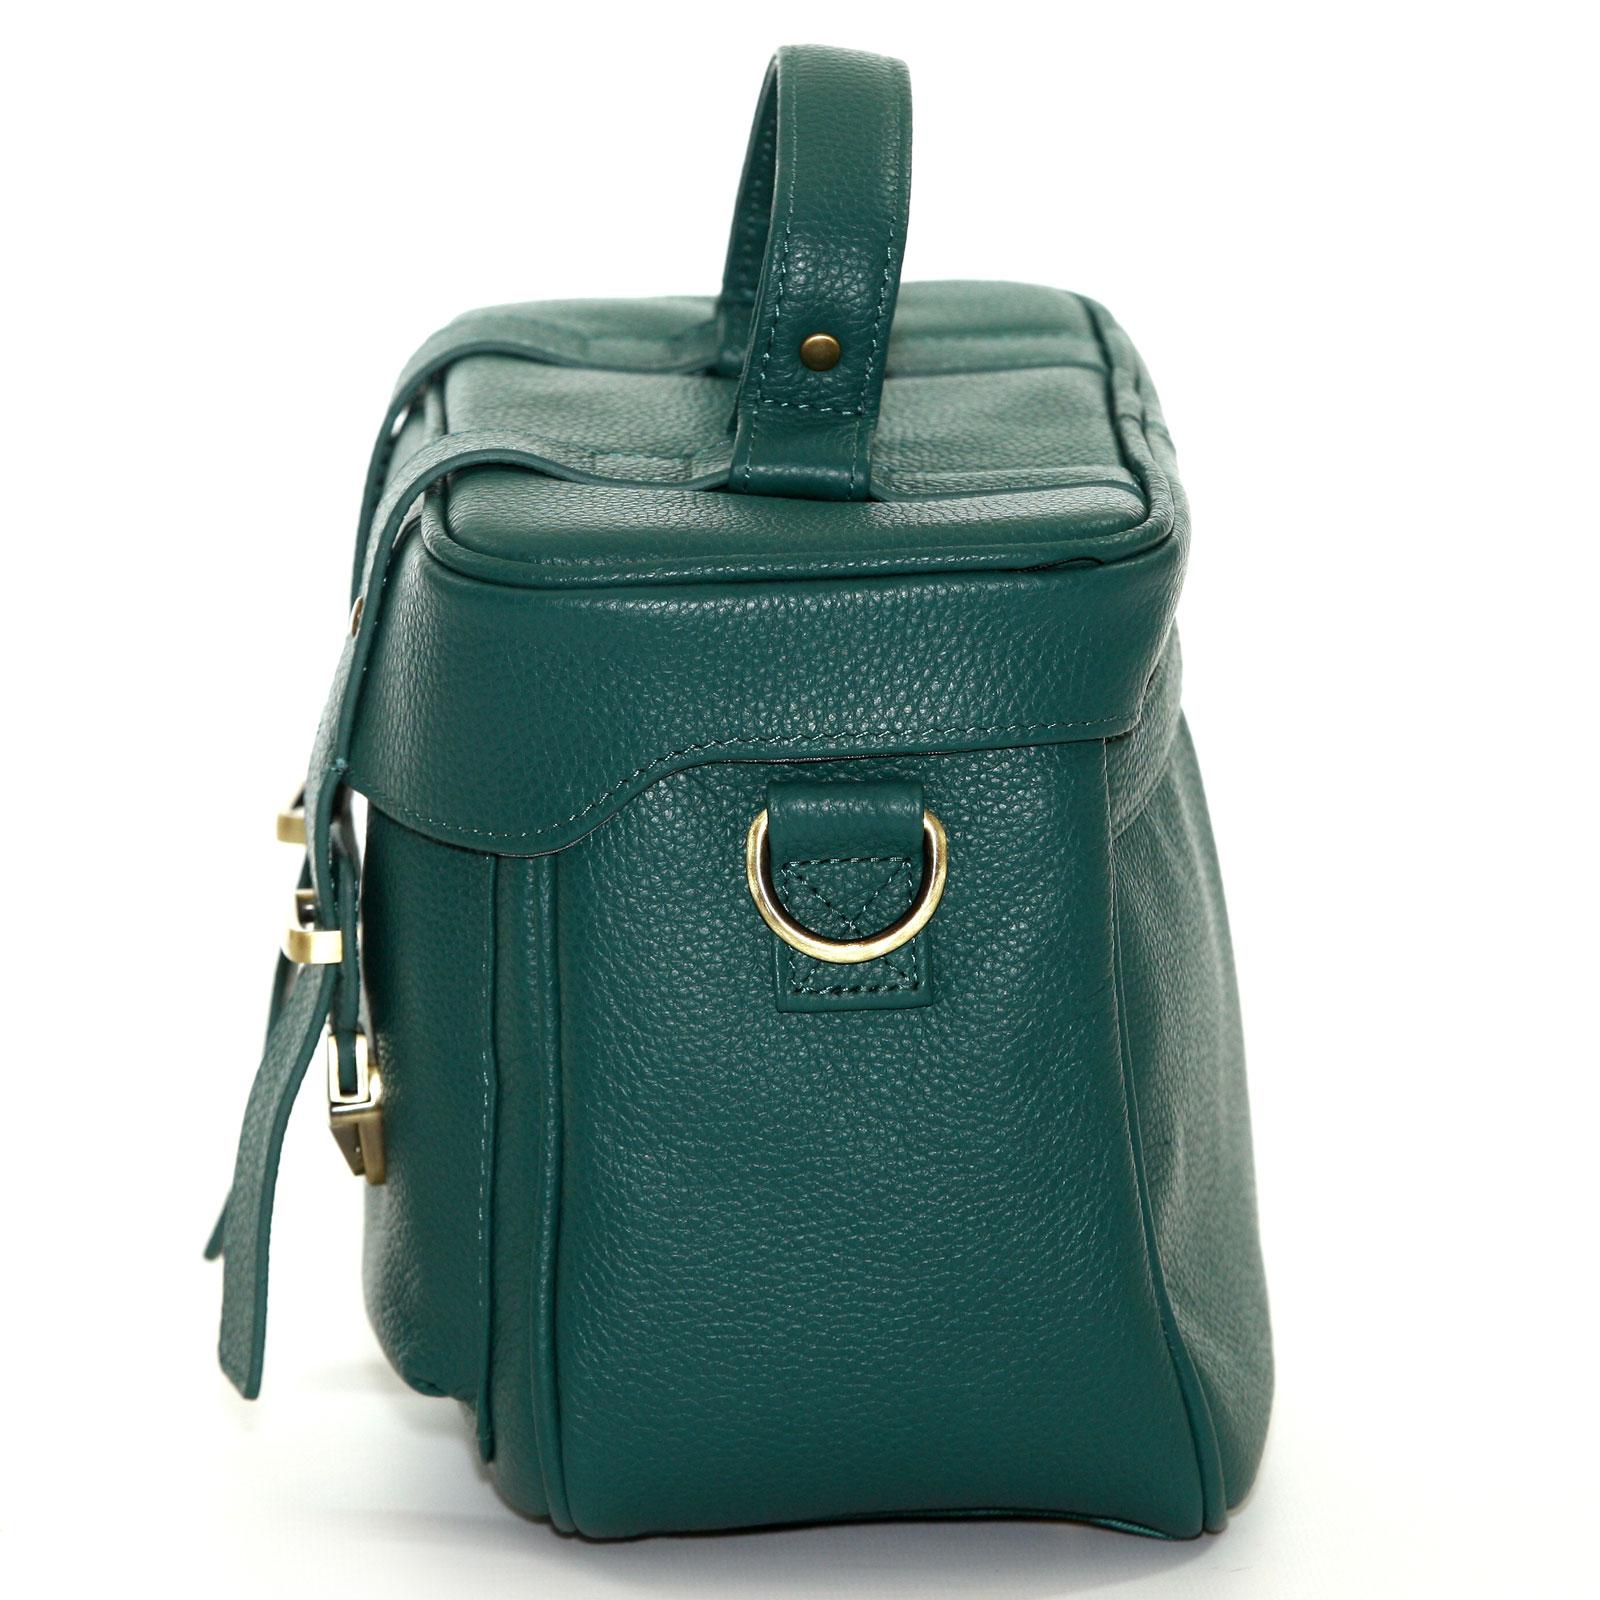 Luxury Dslr Camera Bag Purse Vegan Leather Camera Bag Womens SLR